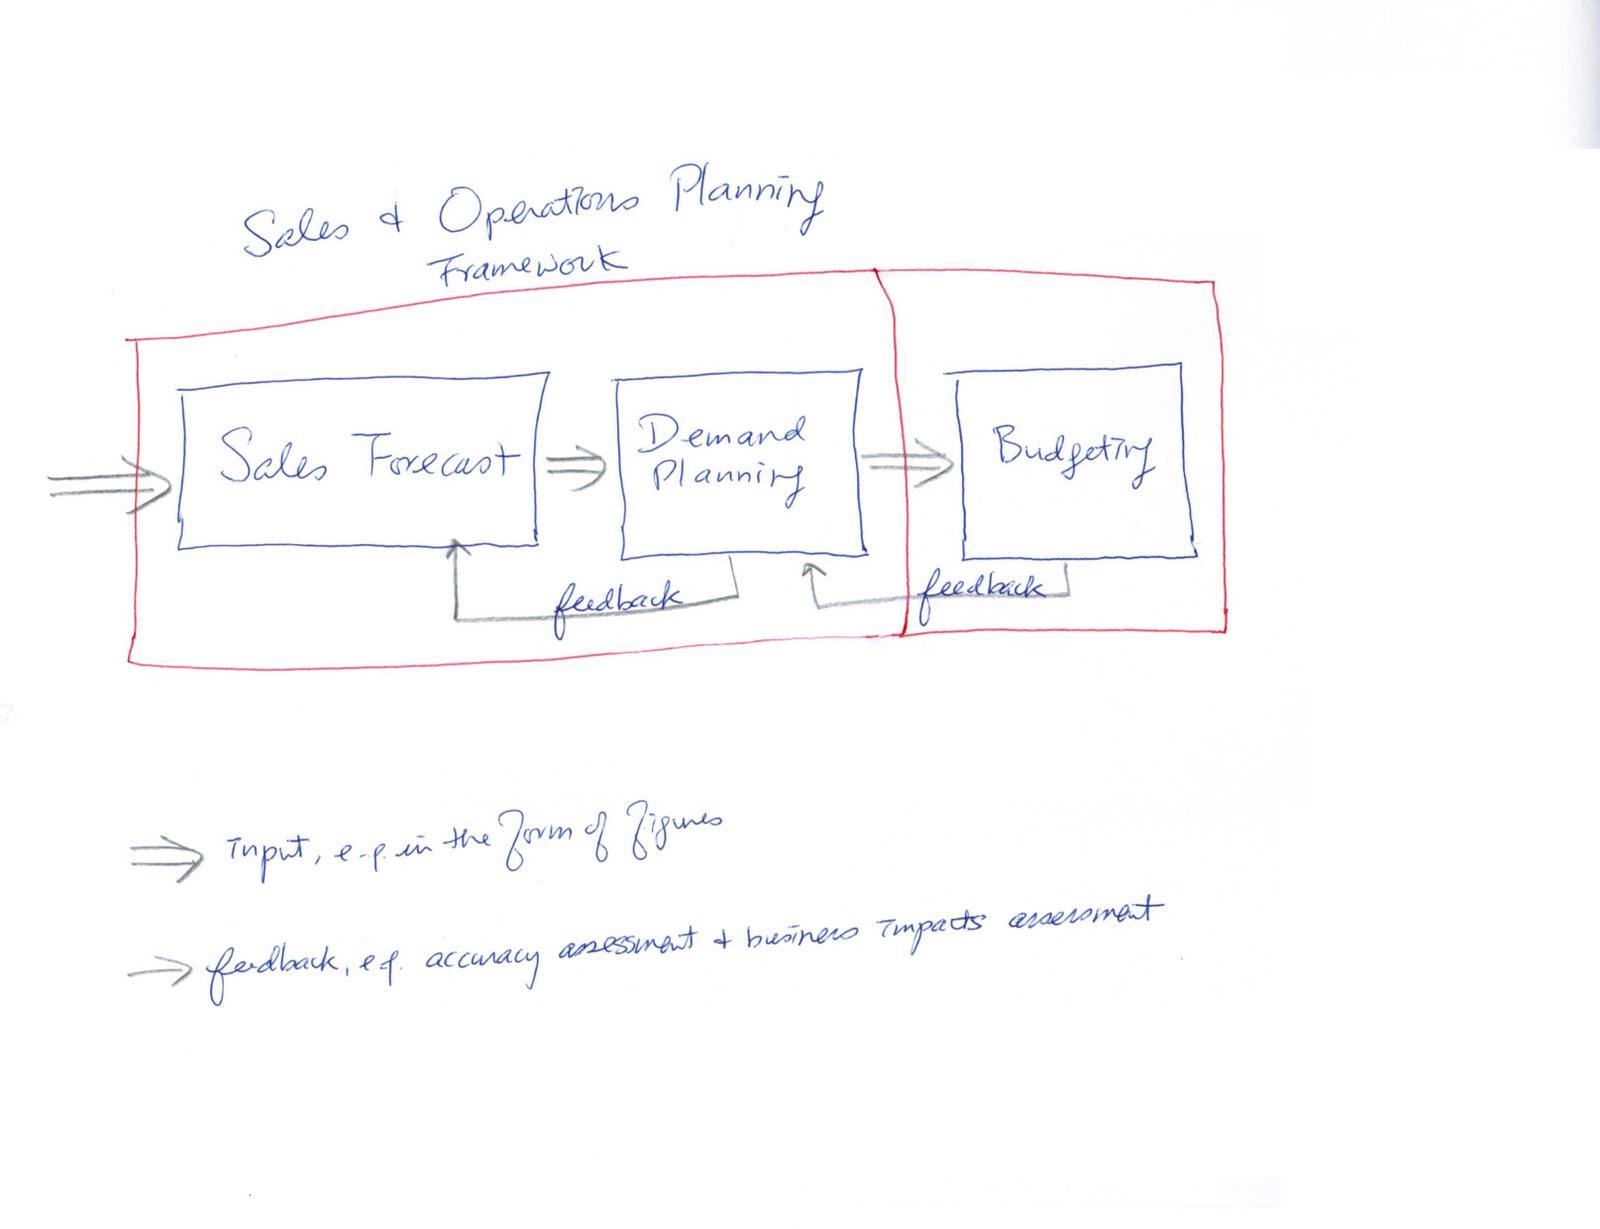 Joseph KK Ho e-resources: Sales forecasting and demand planning: a